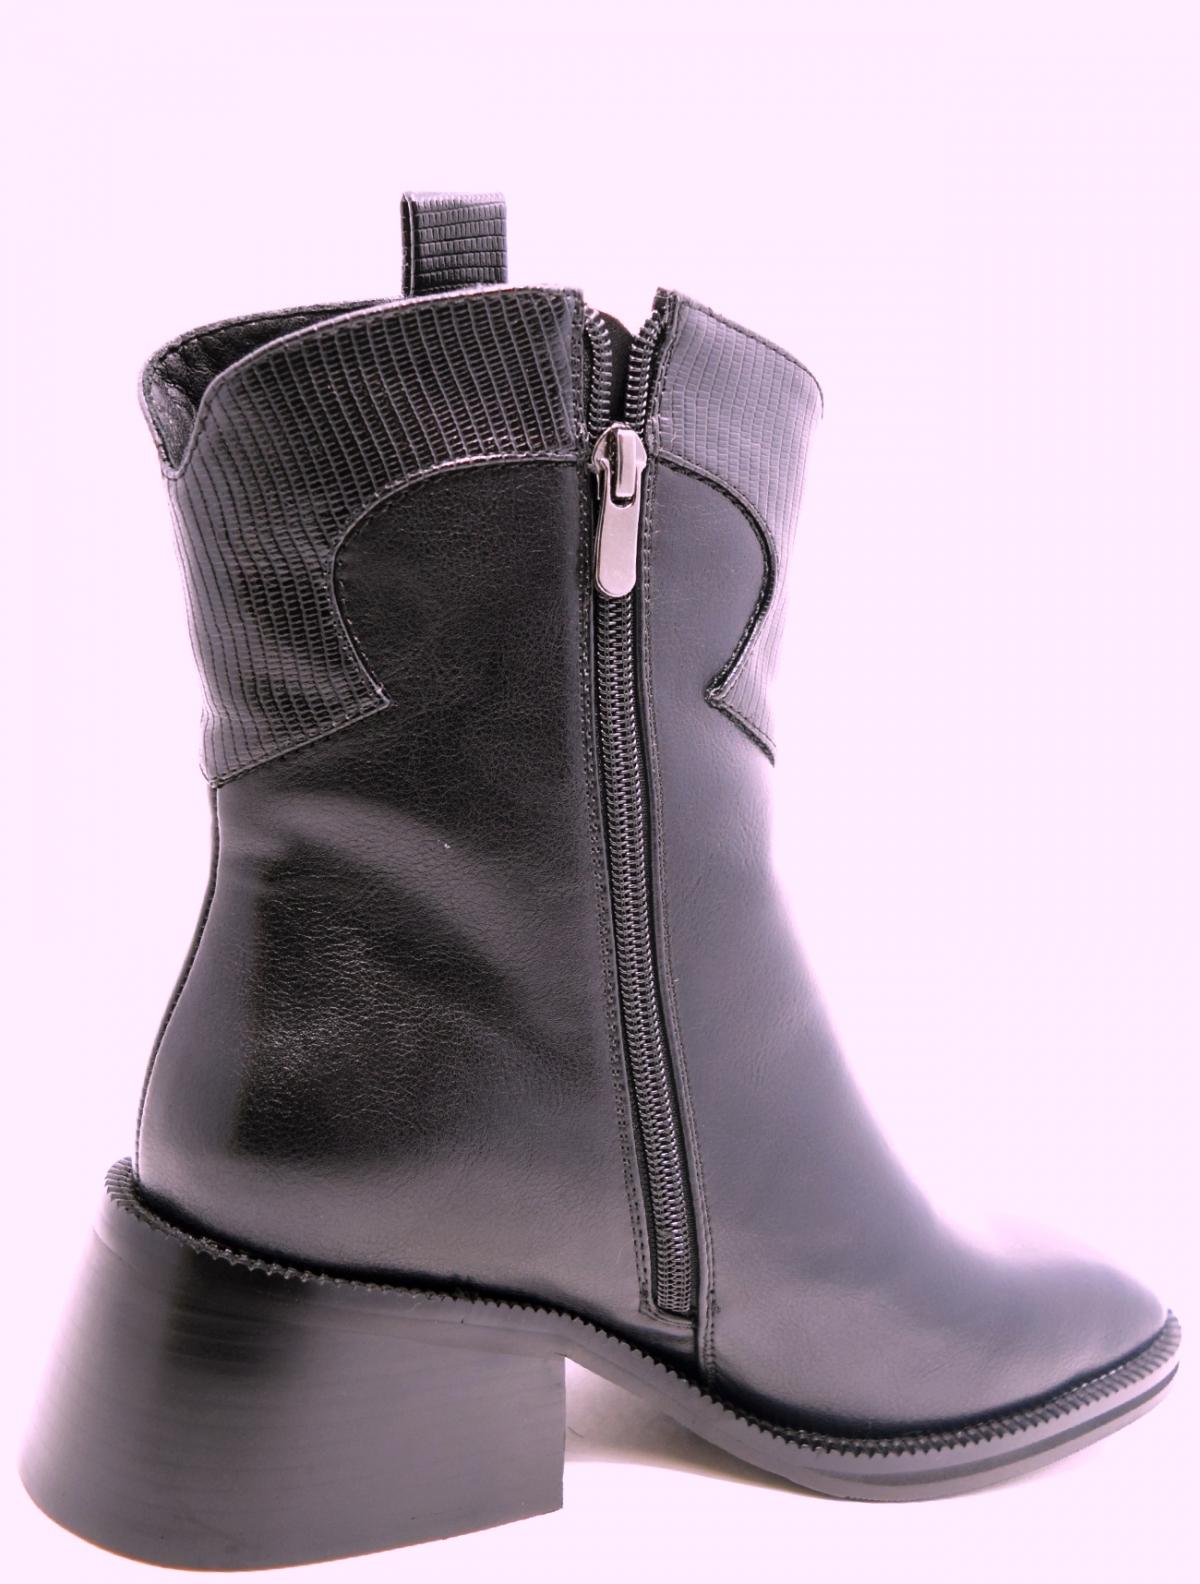 Admlis 7618 женские ботинки